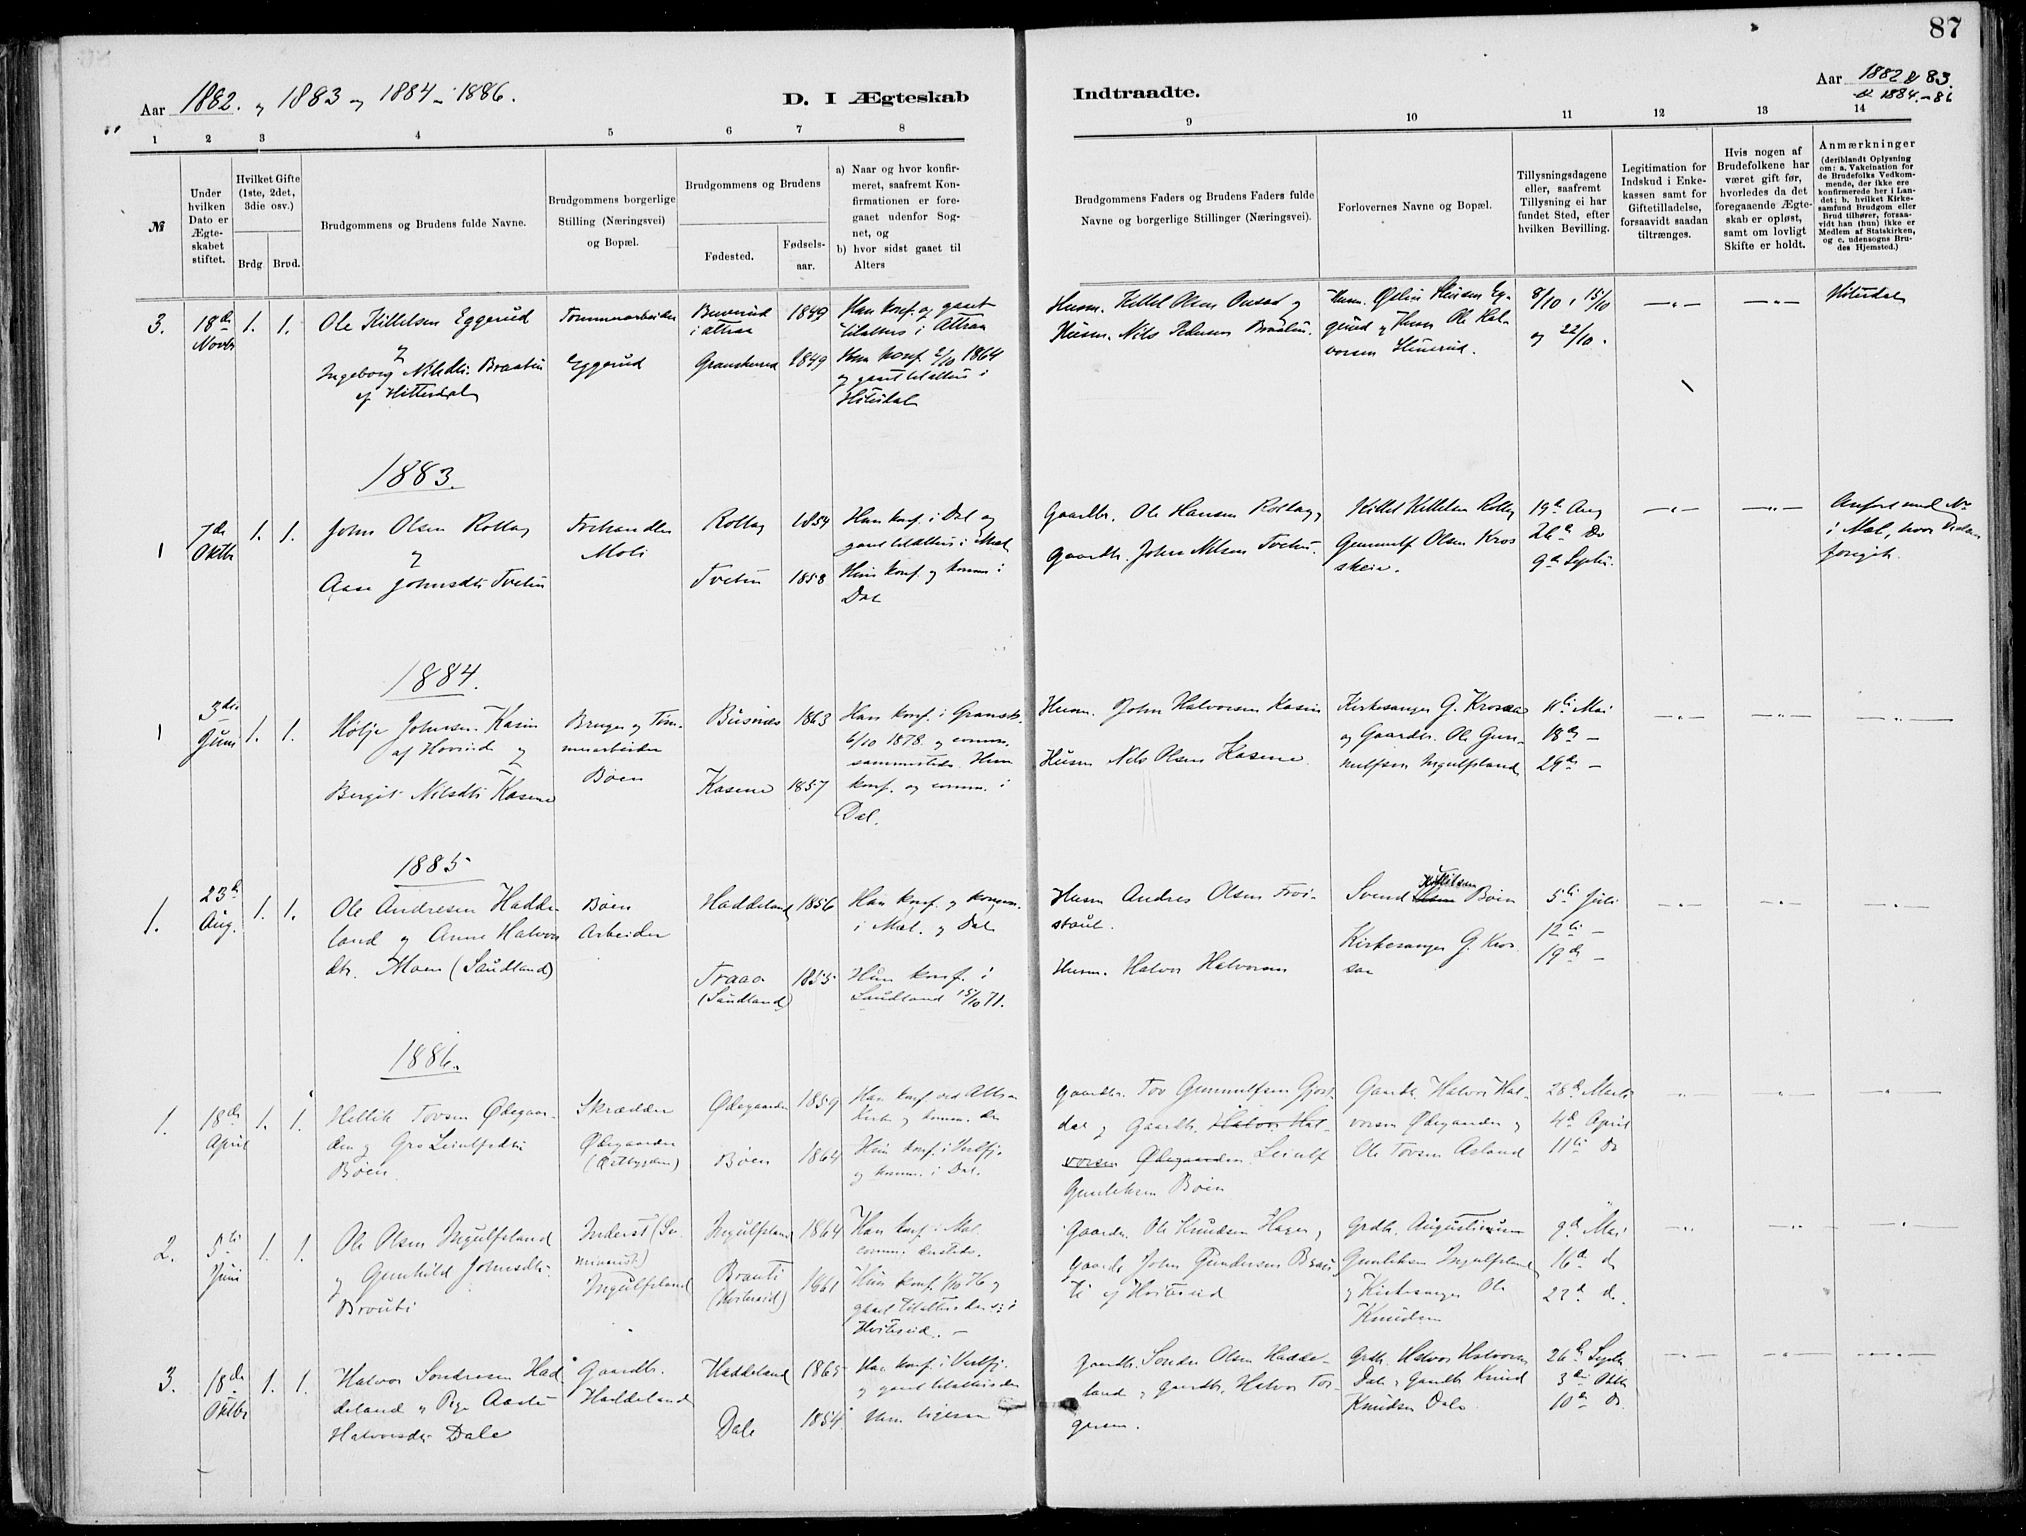 SAKO, Rjukan kirkebøker, F/Fa/L0001: Ministerialbok nr. 1, 1878-1912, s. 87